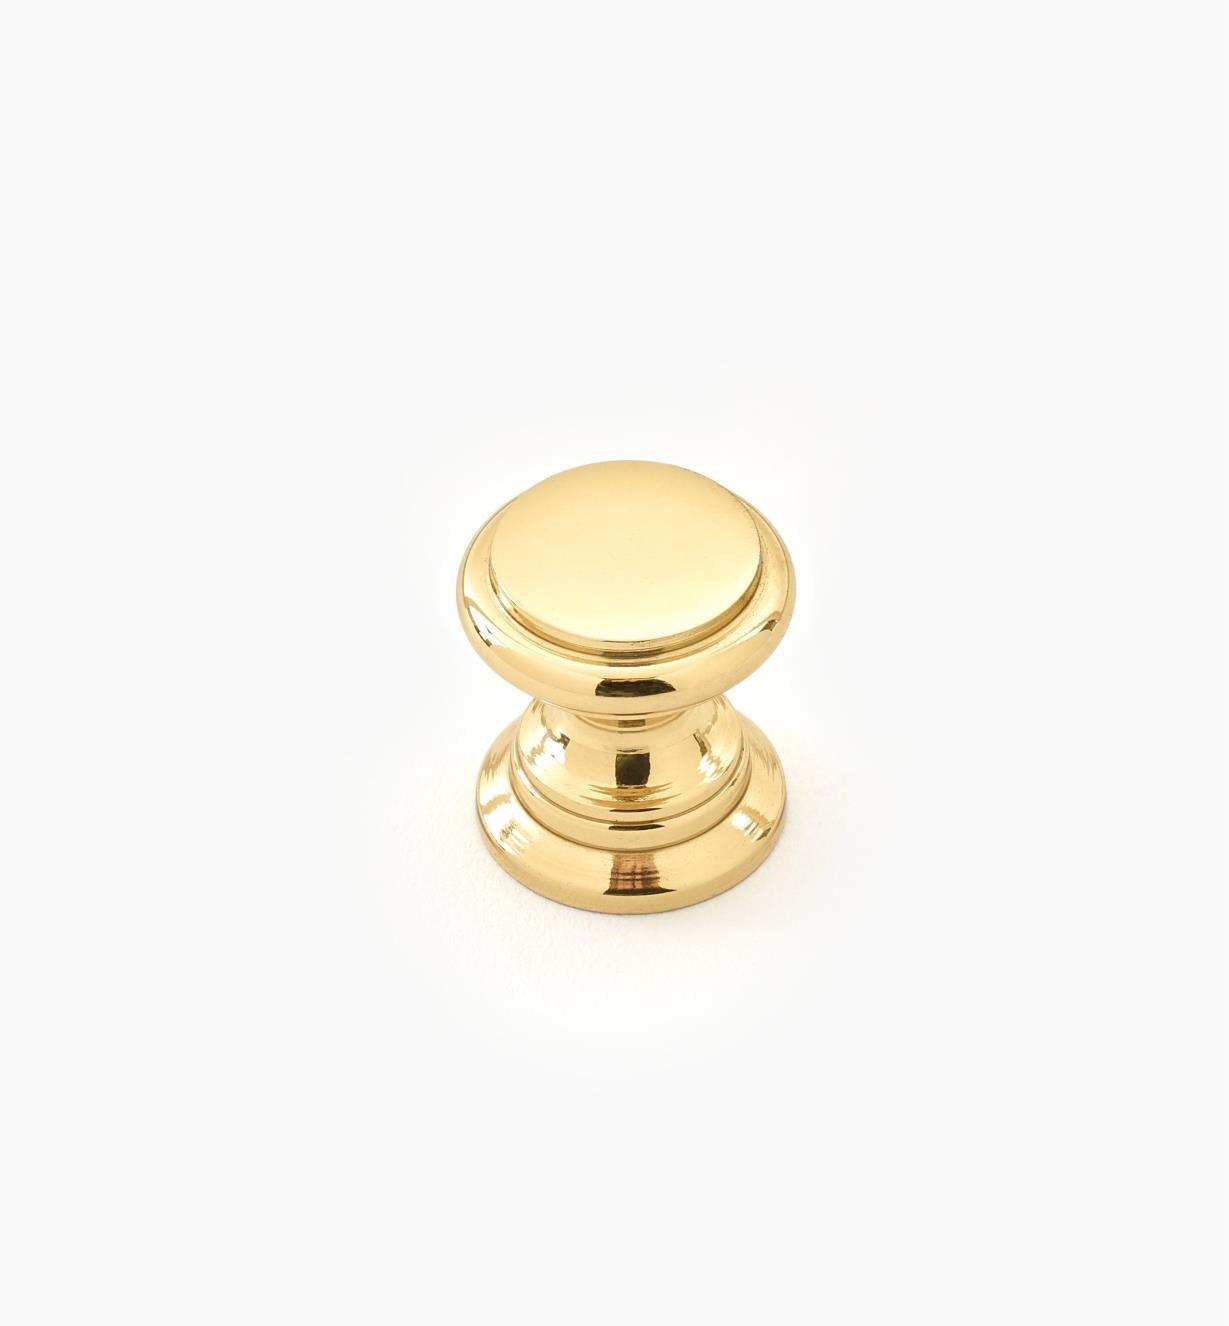 00W3413 - Petit bouton en laiton II, 1/2 po x 1/2 po